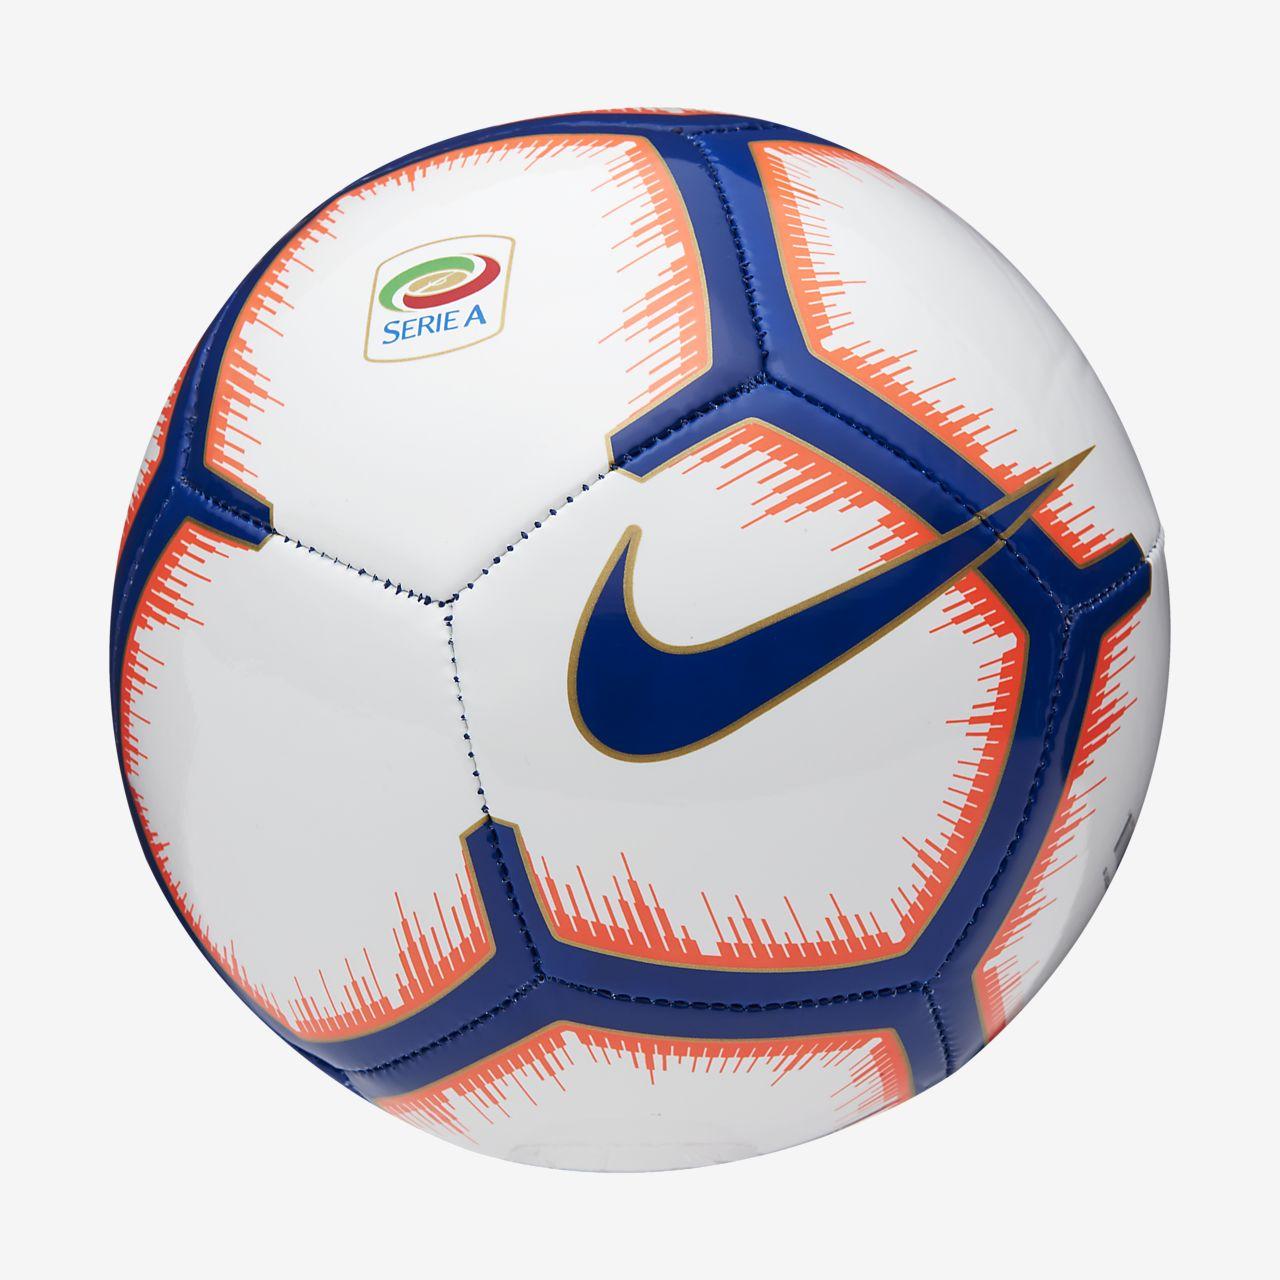 Serie A Skills futball-labda